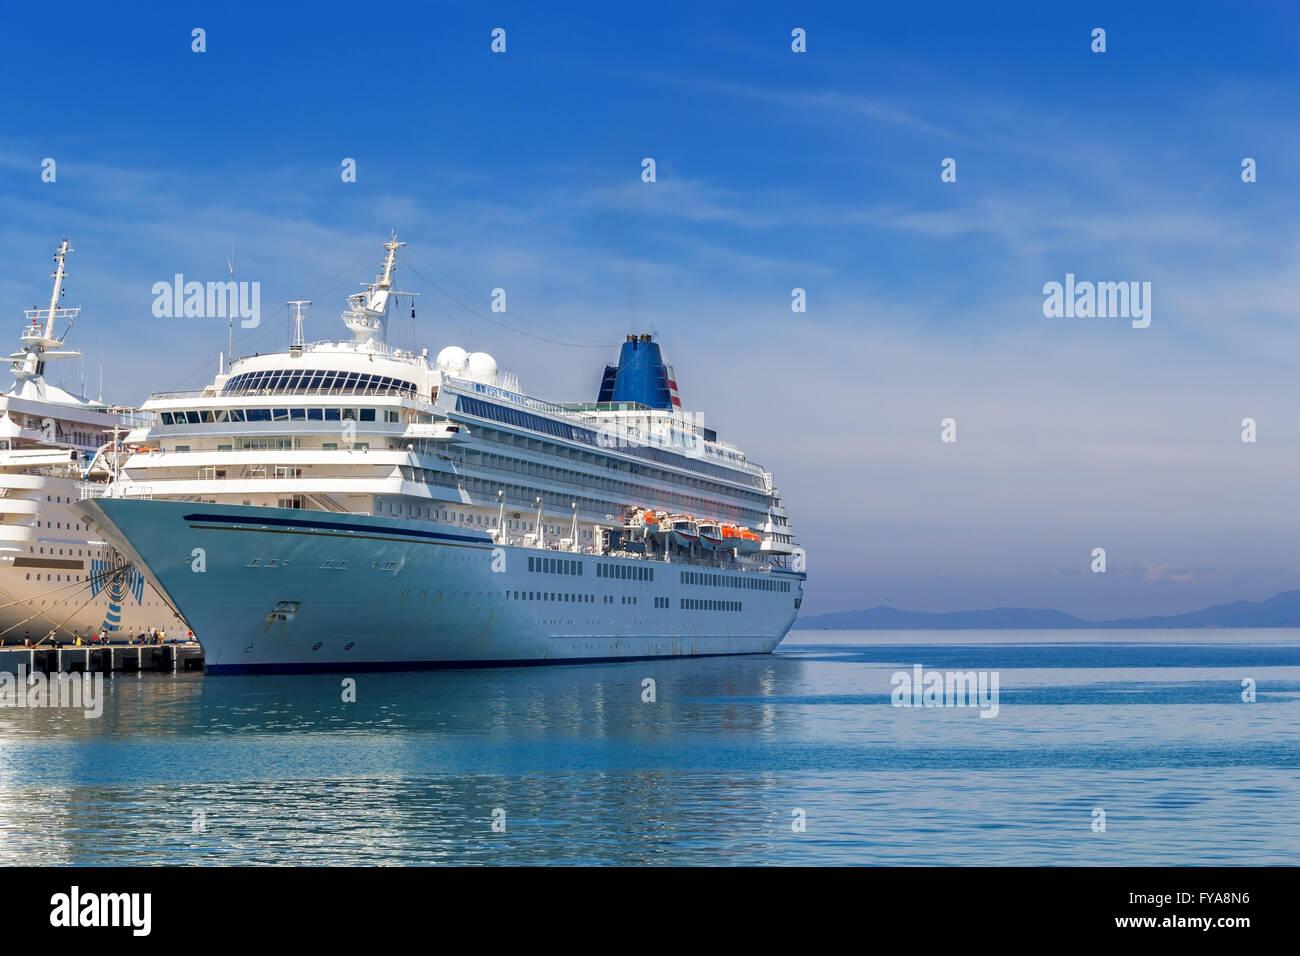 big passenger ship in hot summer day - Stock Image